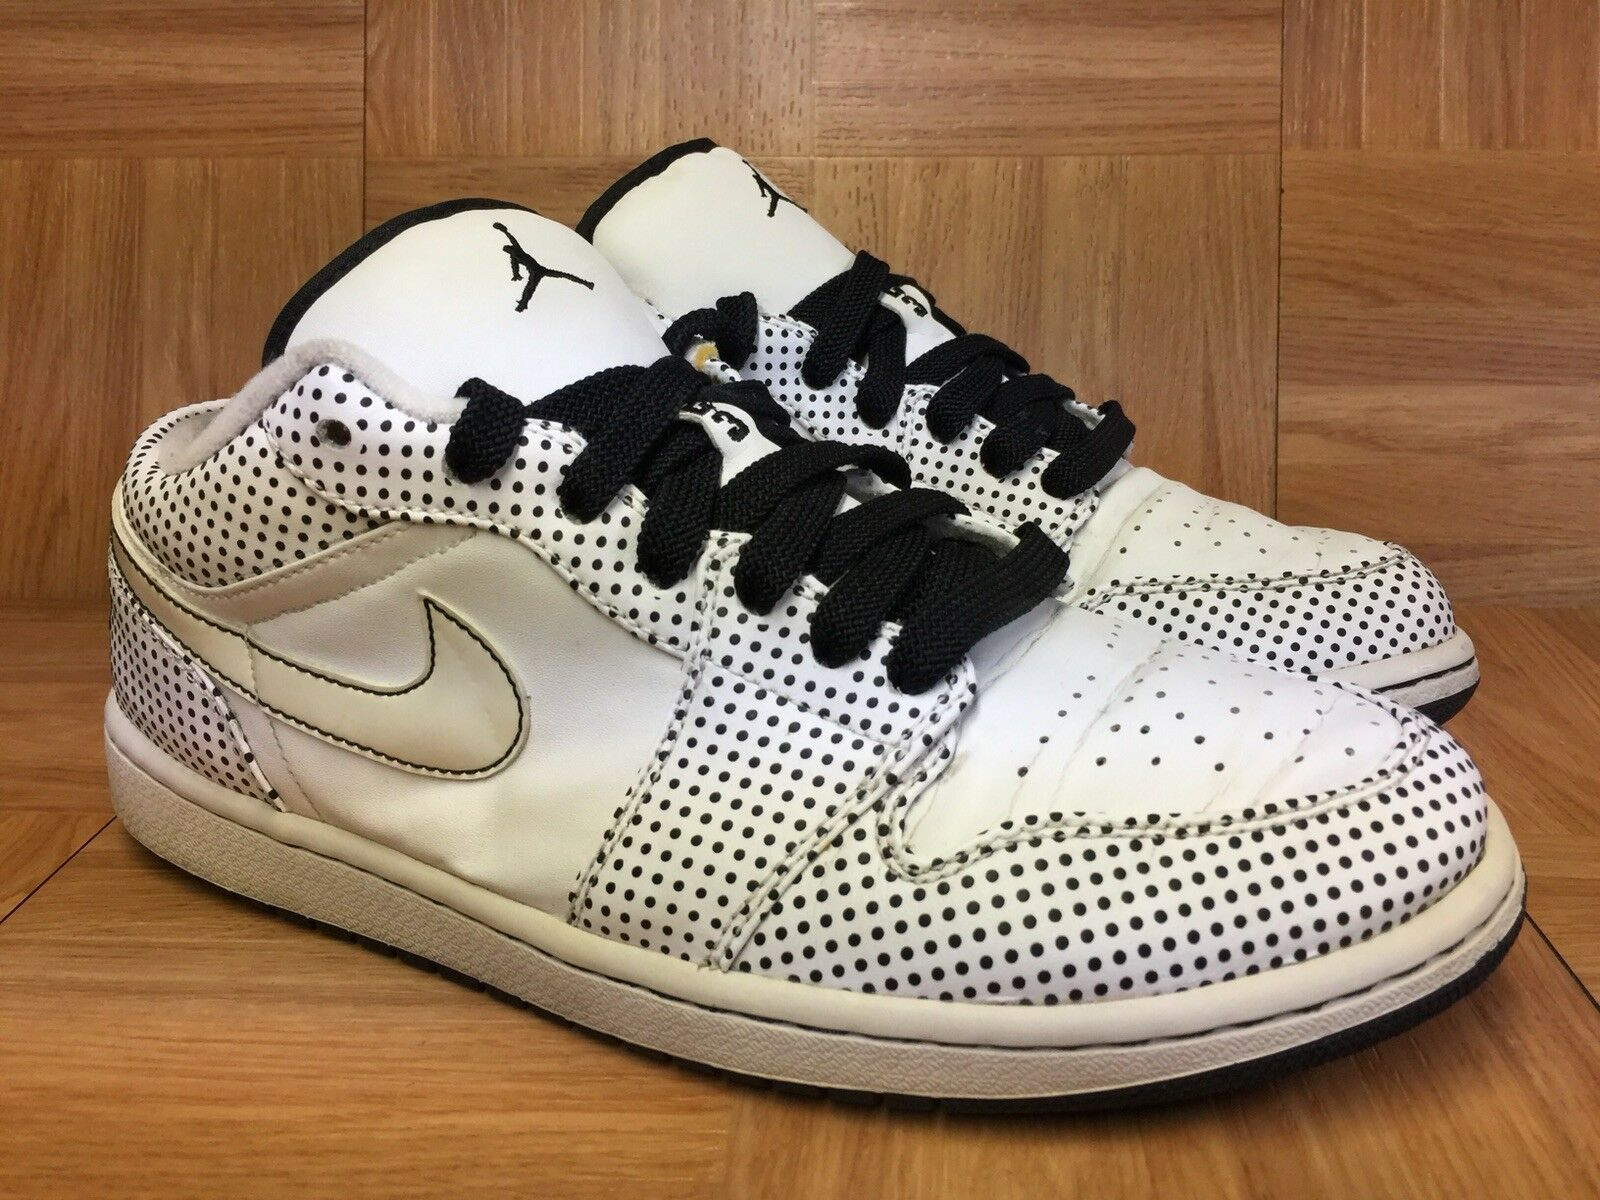 RARE Nike Air Jordan 1 Phat Low Polka Dots White Black Aj1 Sz 9.5 338145-102